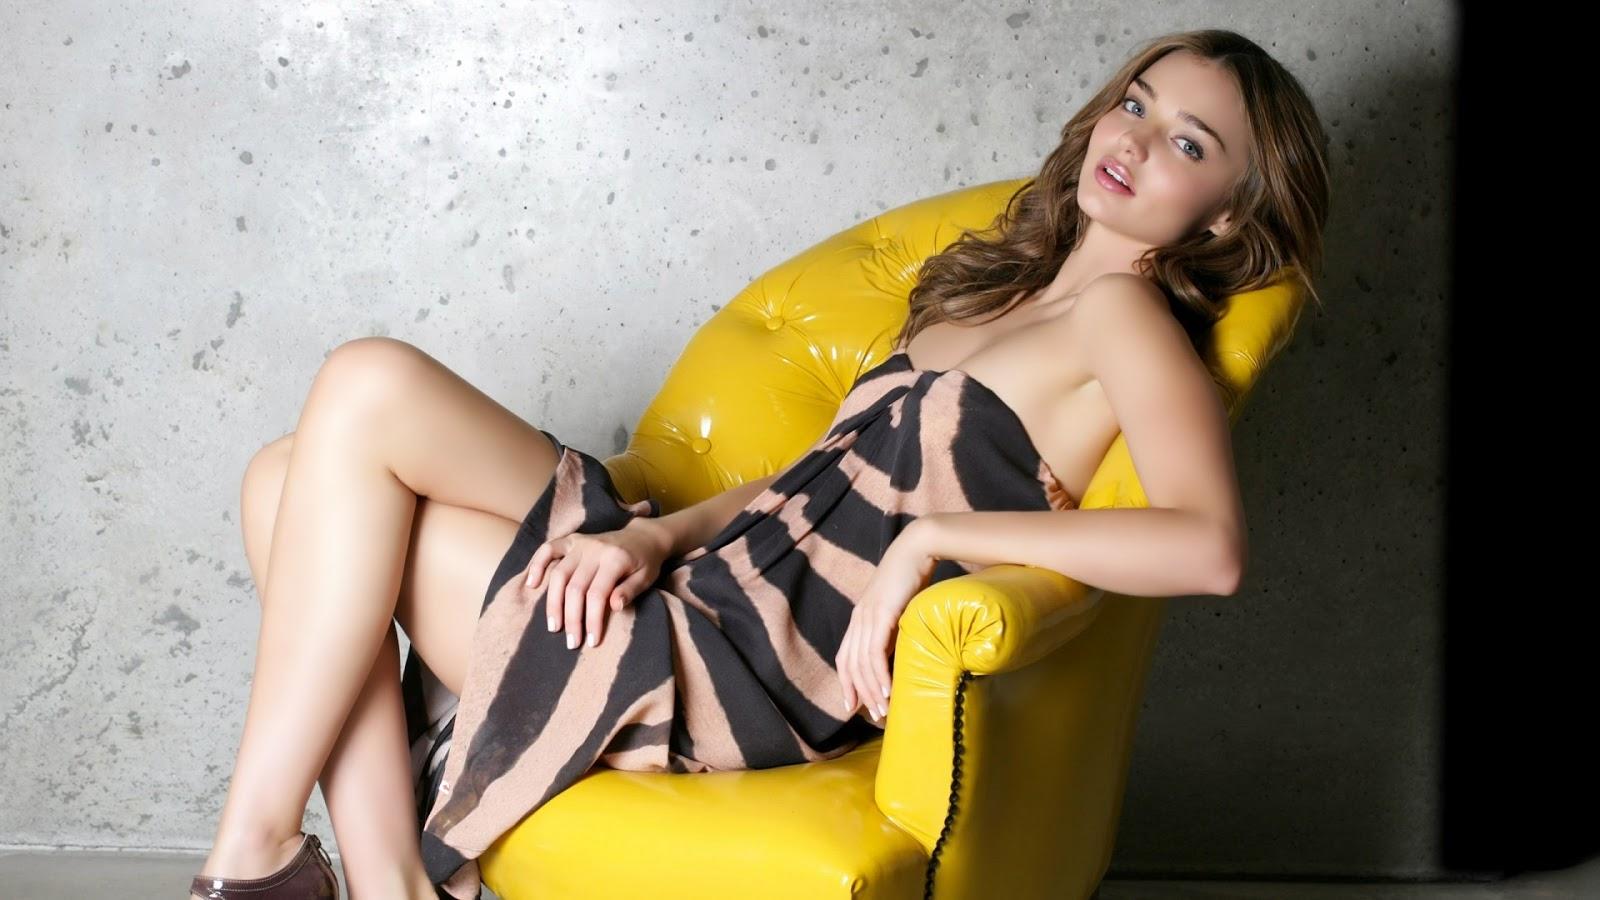 Best Home Computer Chair Teak Lounge Chairs Outdoor Miranda Kerr Hd Wallpapers Free Download   Theroyalspeaker